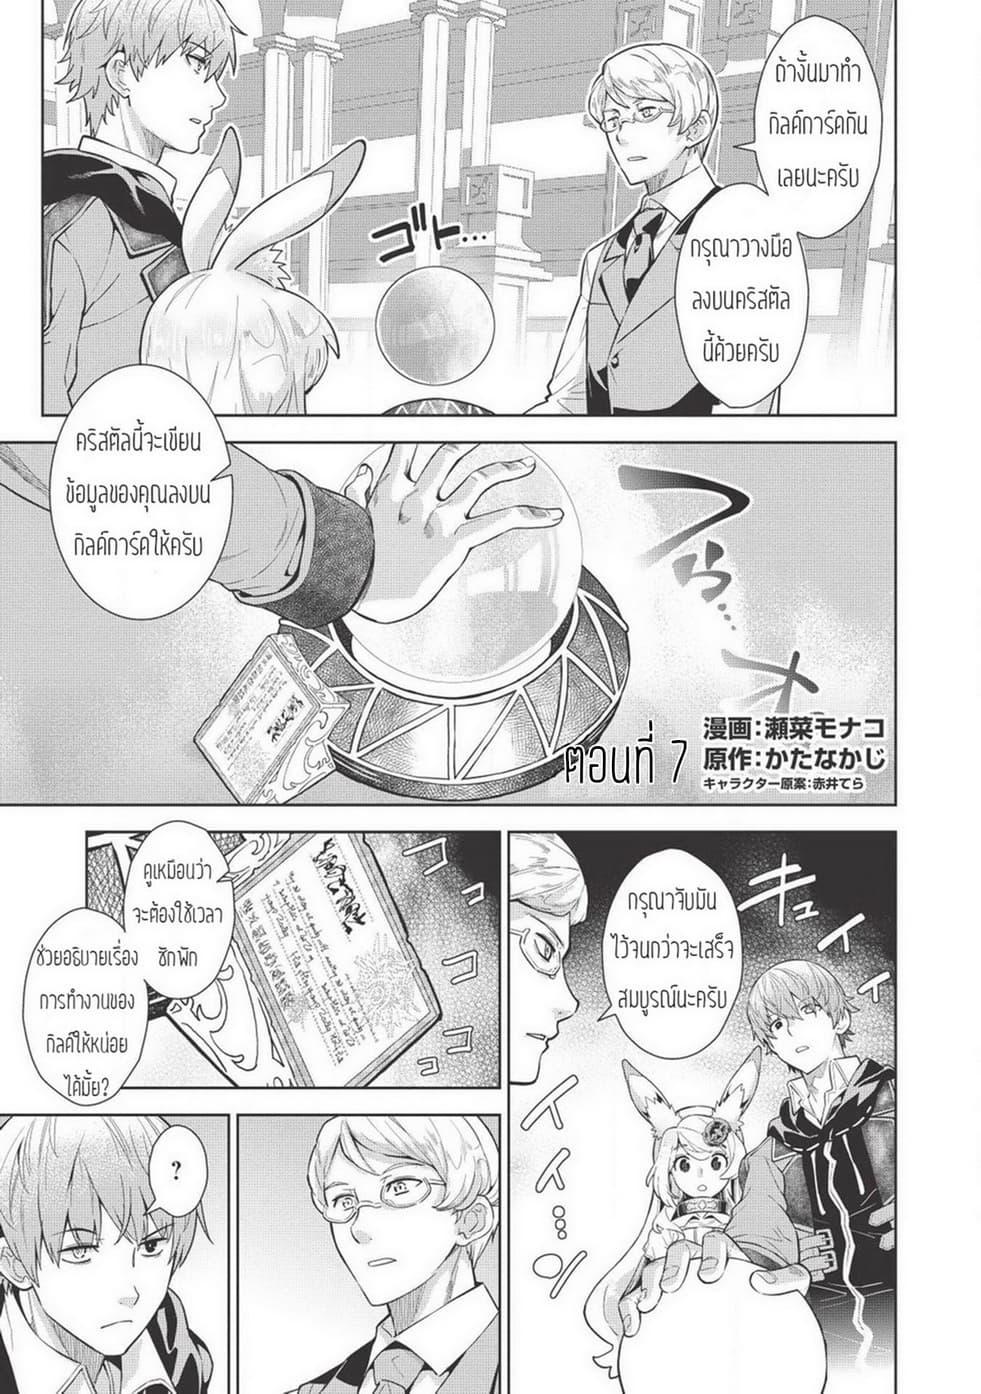 Magan to Dangan o Tsukatte Isekai o Buchinuku! ตอนที่ 7